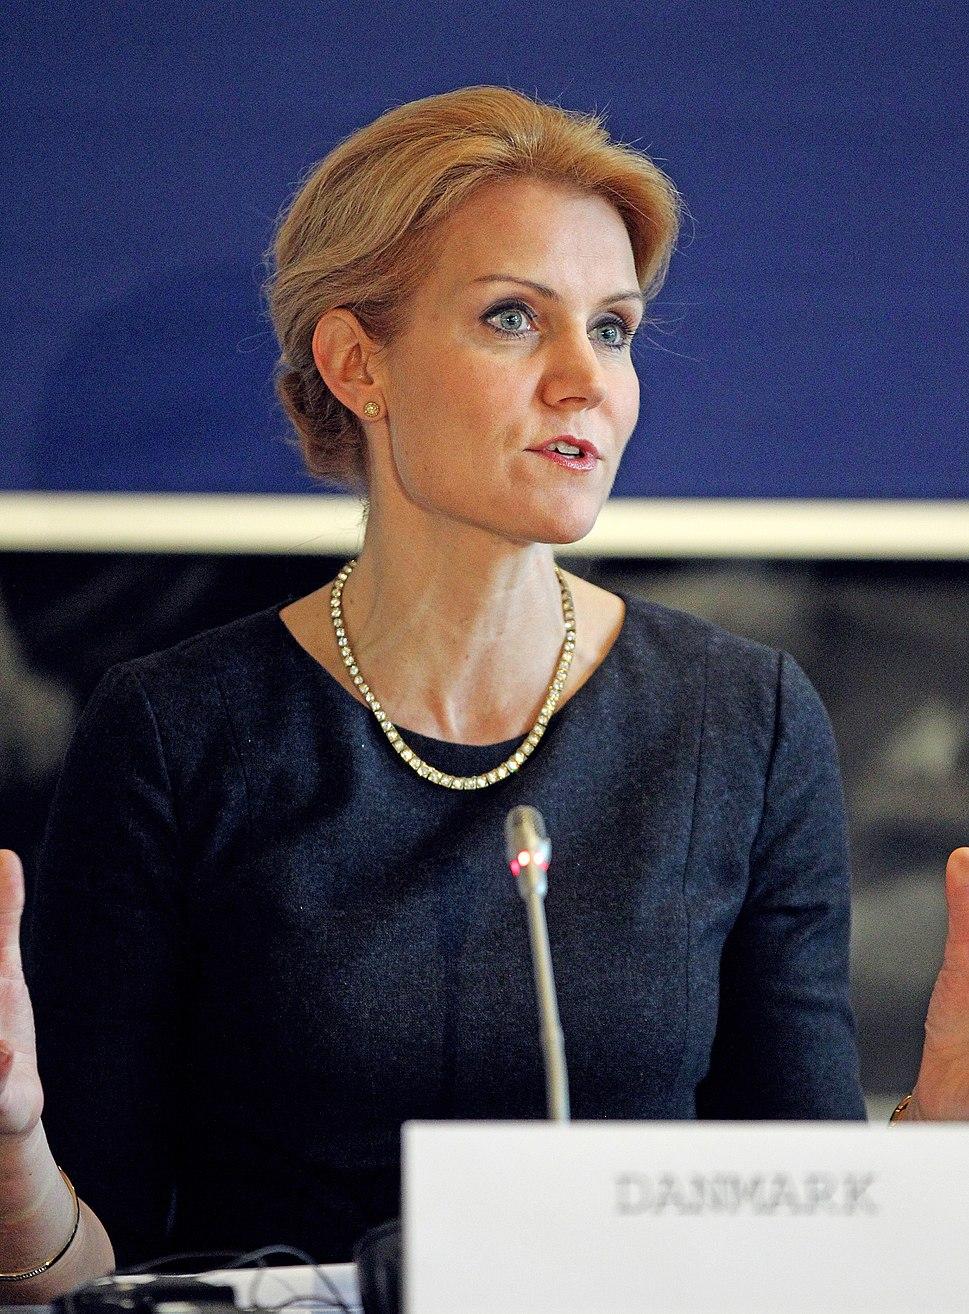 Danmarks statsminister Helle Thorning-Schmidt vid de nordiska statsministrarnas mote vid Nordiska Radets session i Kopenhamn (1)